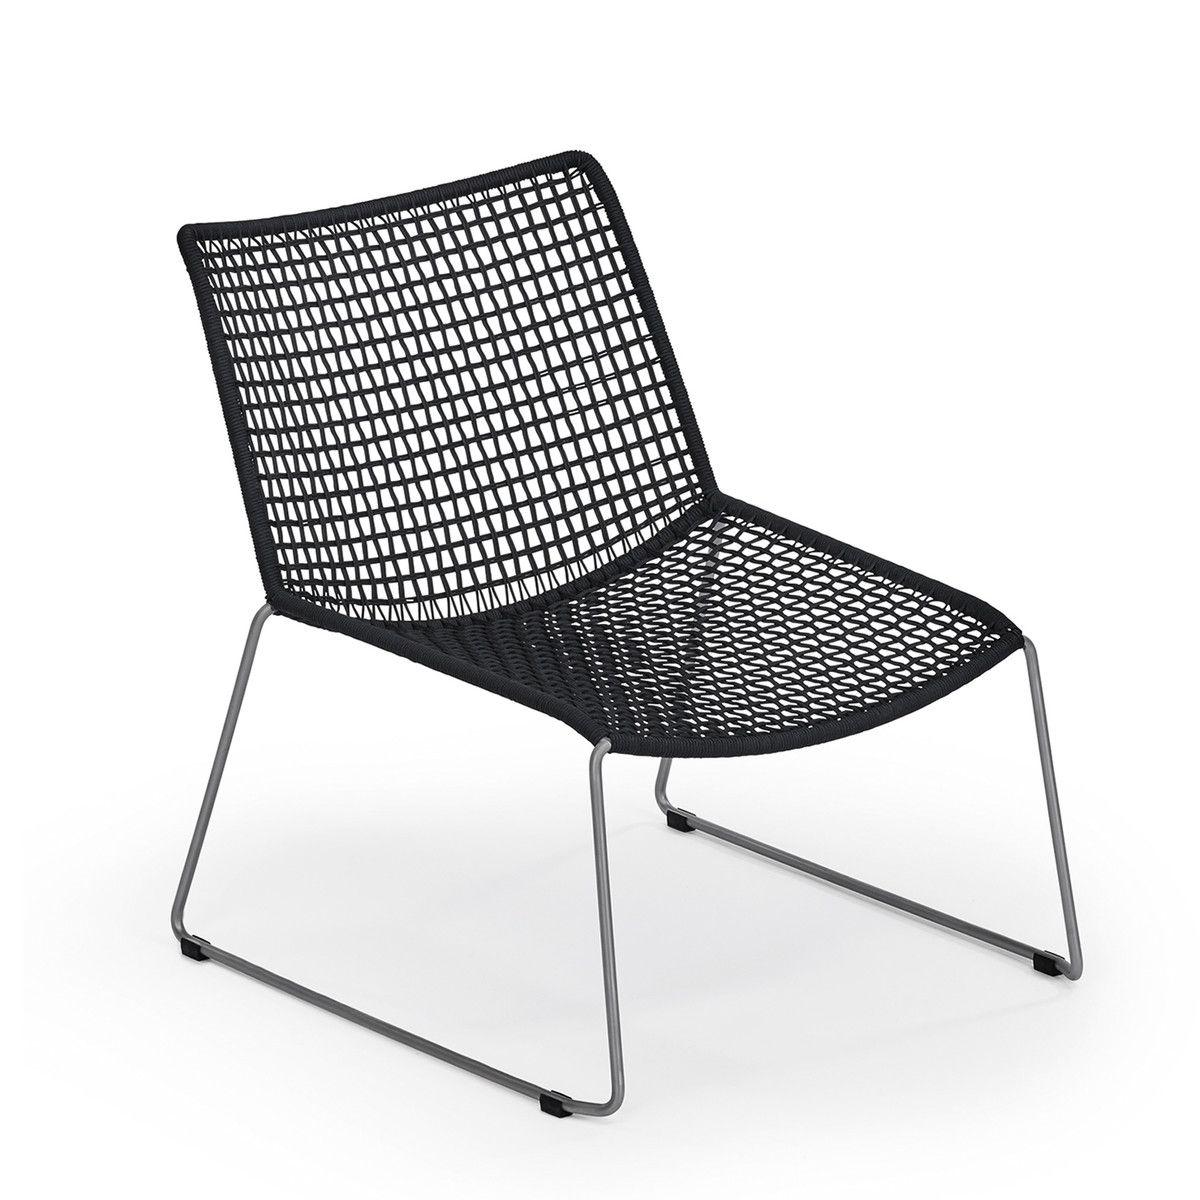 Gartensessel lounge  Weishäupl - Slope Lounge Sessel, schwarz | Lounge sessel, Sessel ...